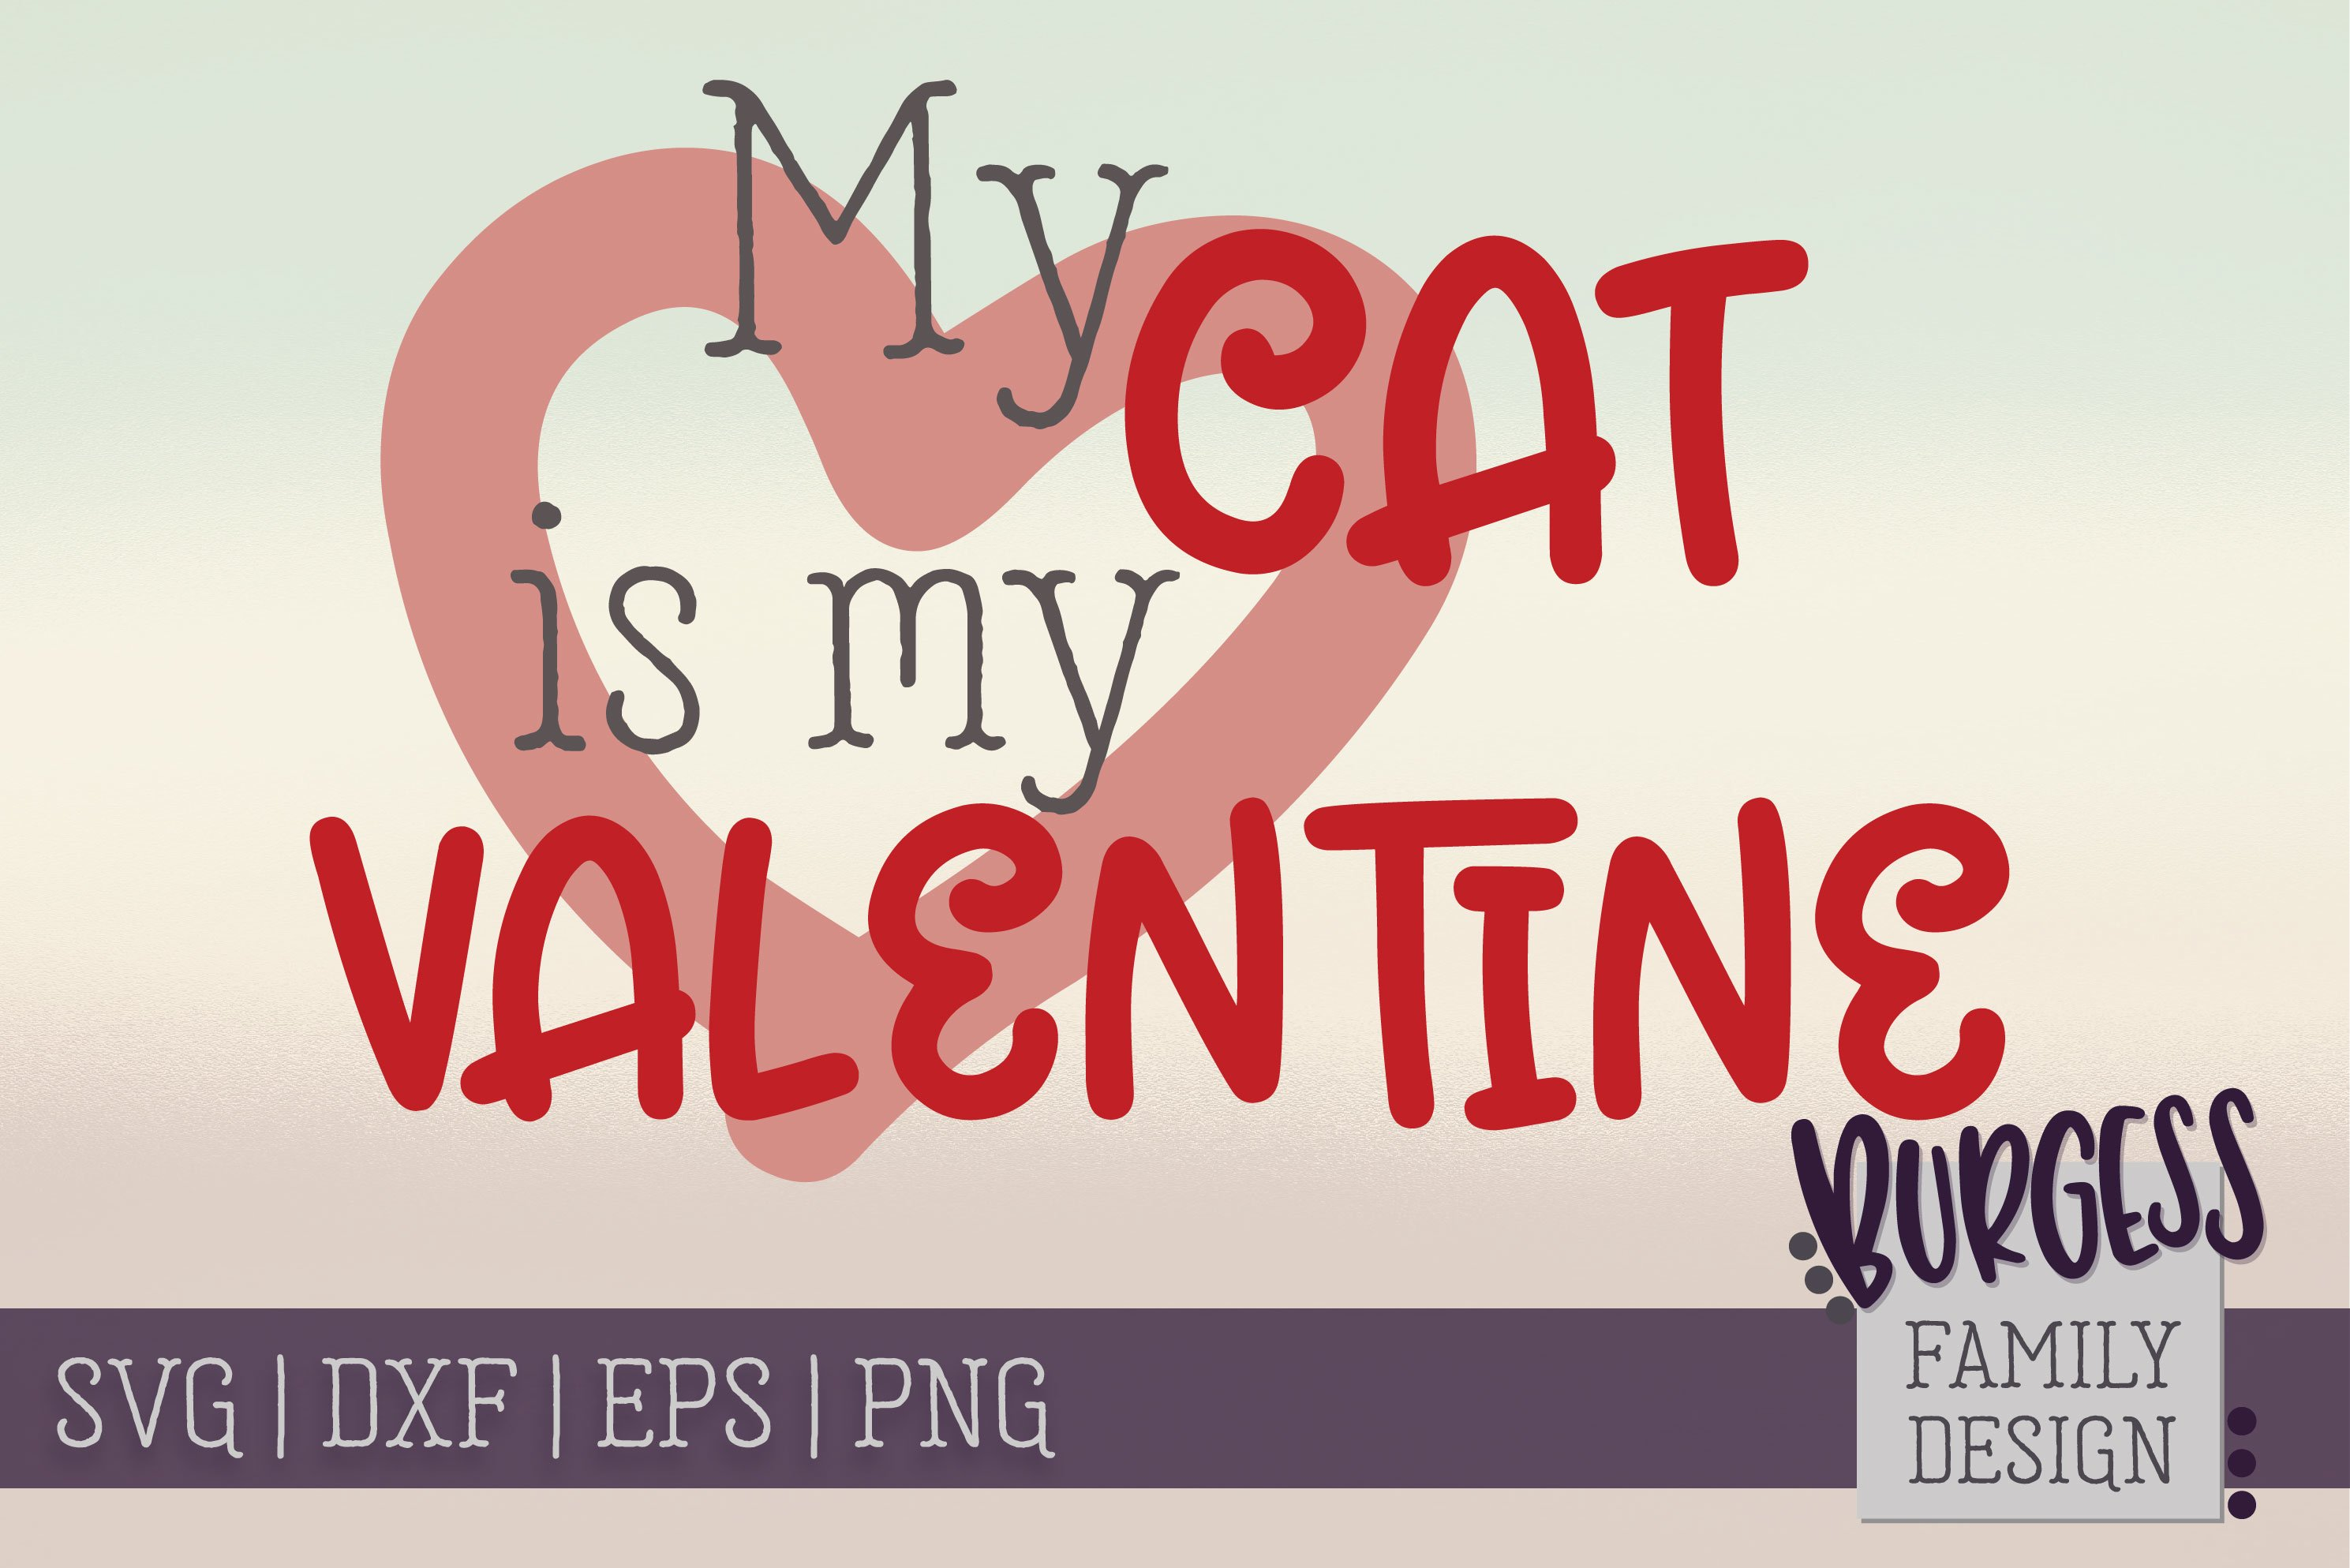 Download My Cat Is My Valentine Svg Dxf Eps Png 179528 Svgs Design Bundles